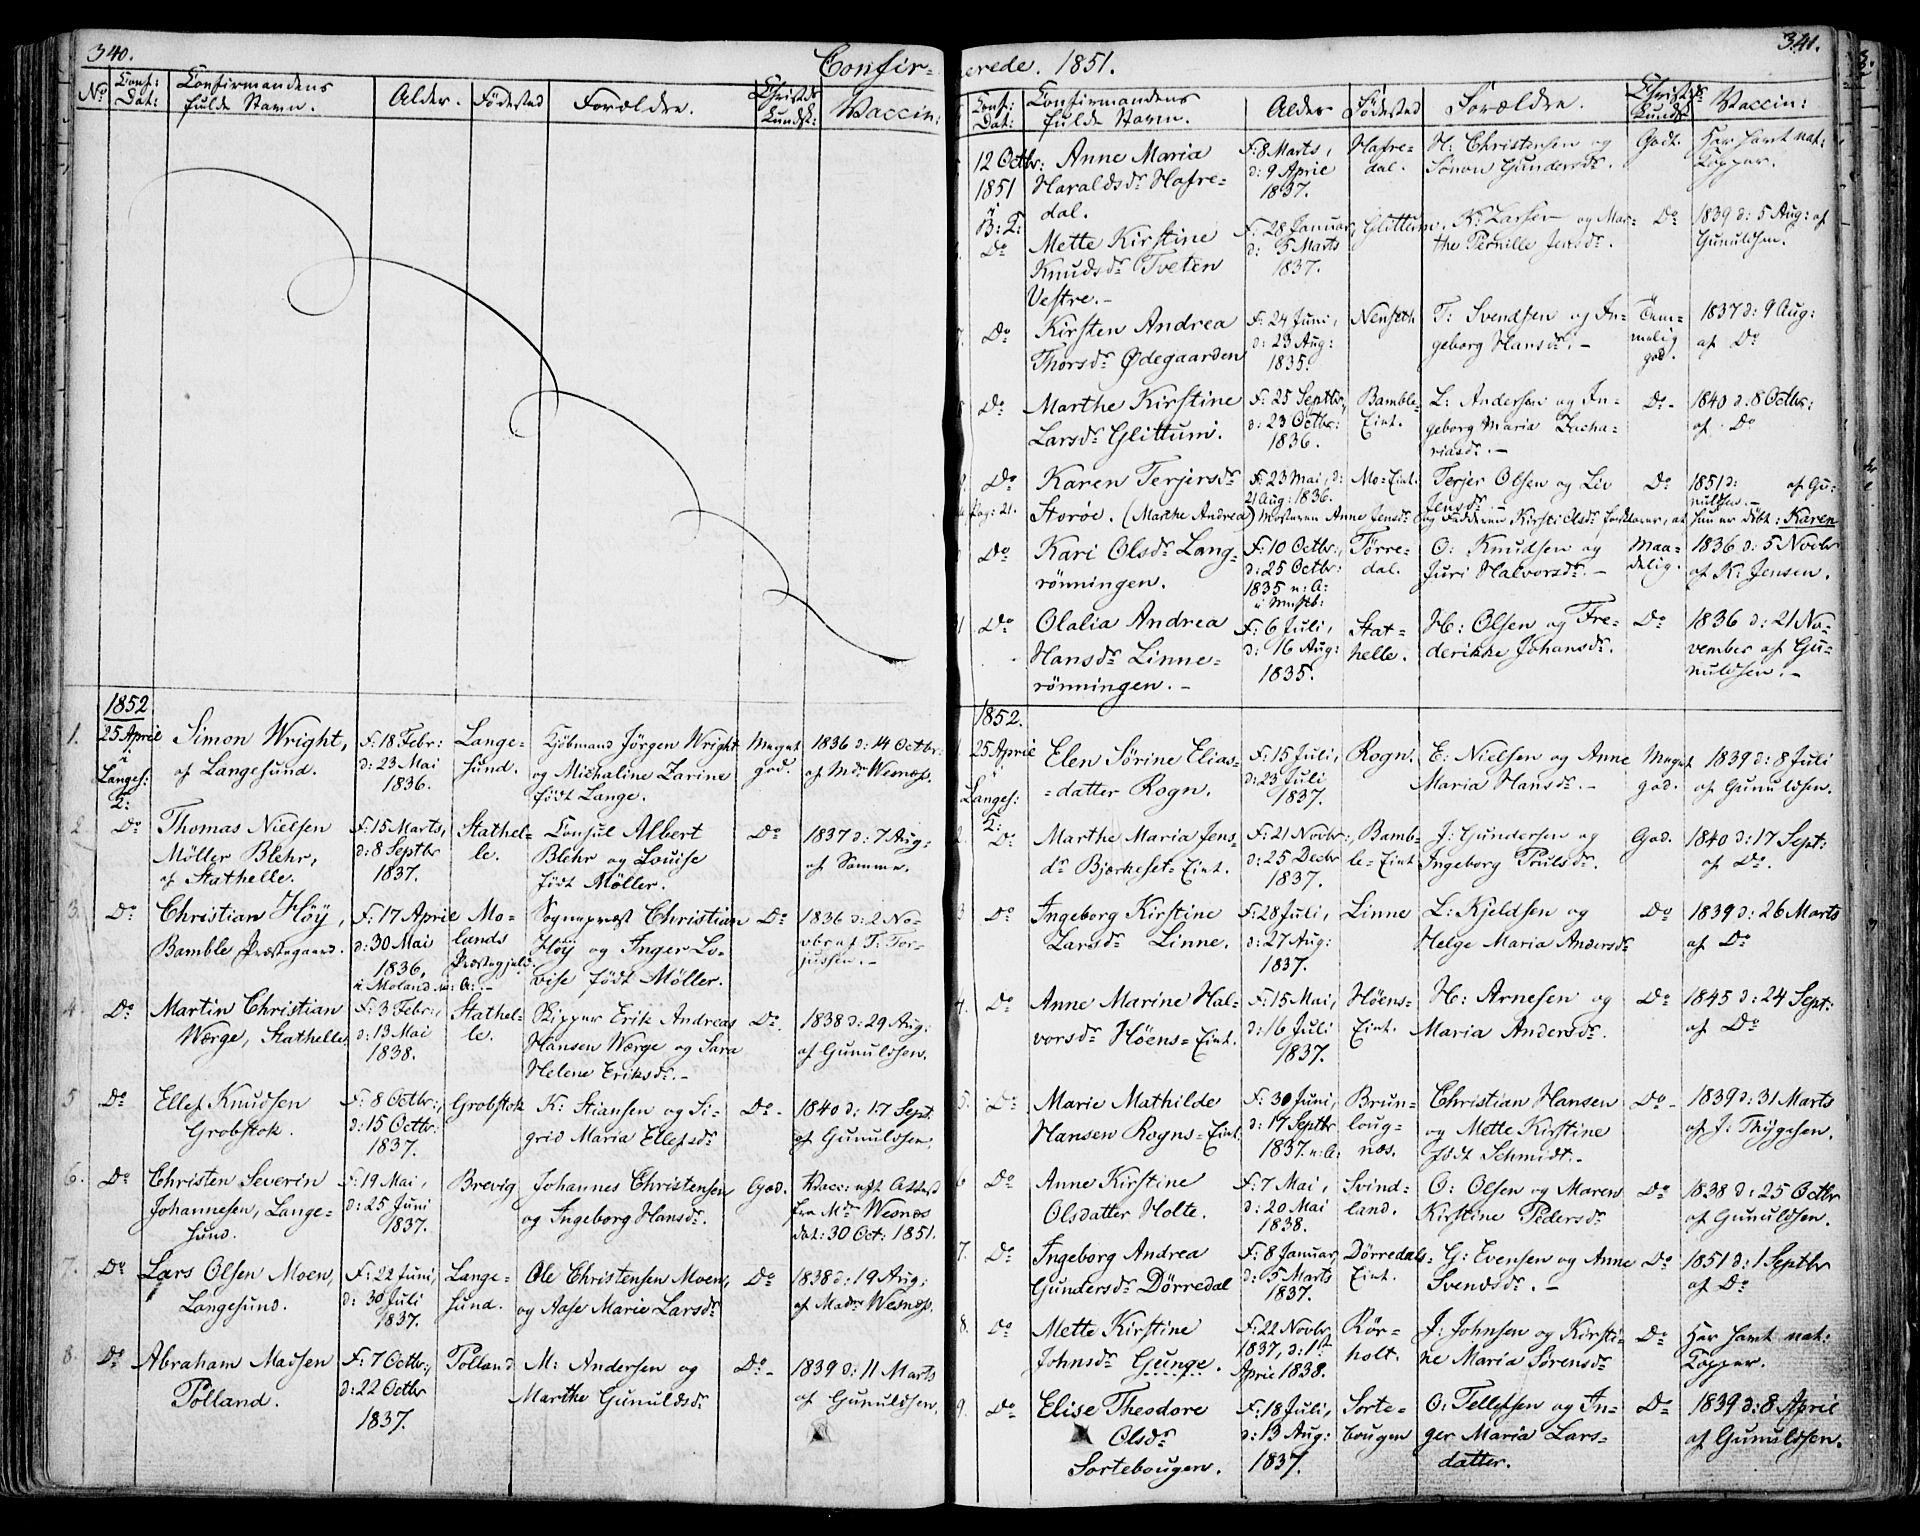 SAKO, Bamble kirkebøker, F/Fa/L0004: Ministerialbok nr. I 4, 1834-1853, s. 340-341